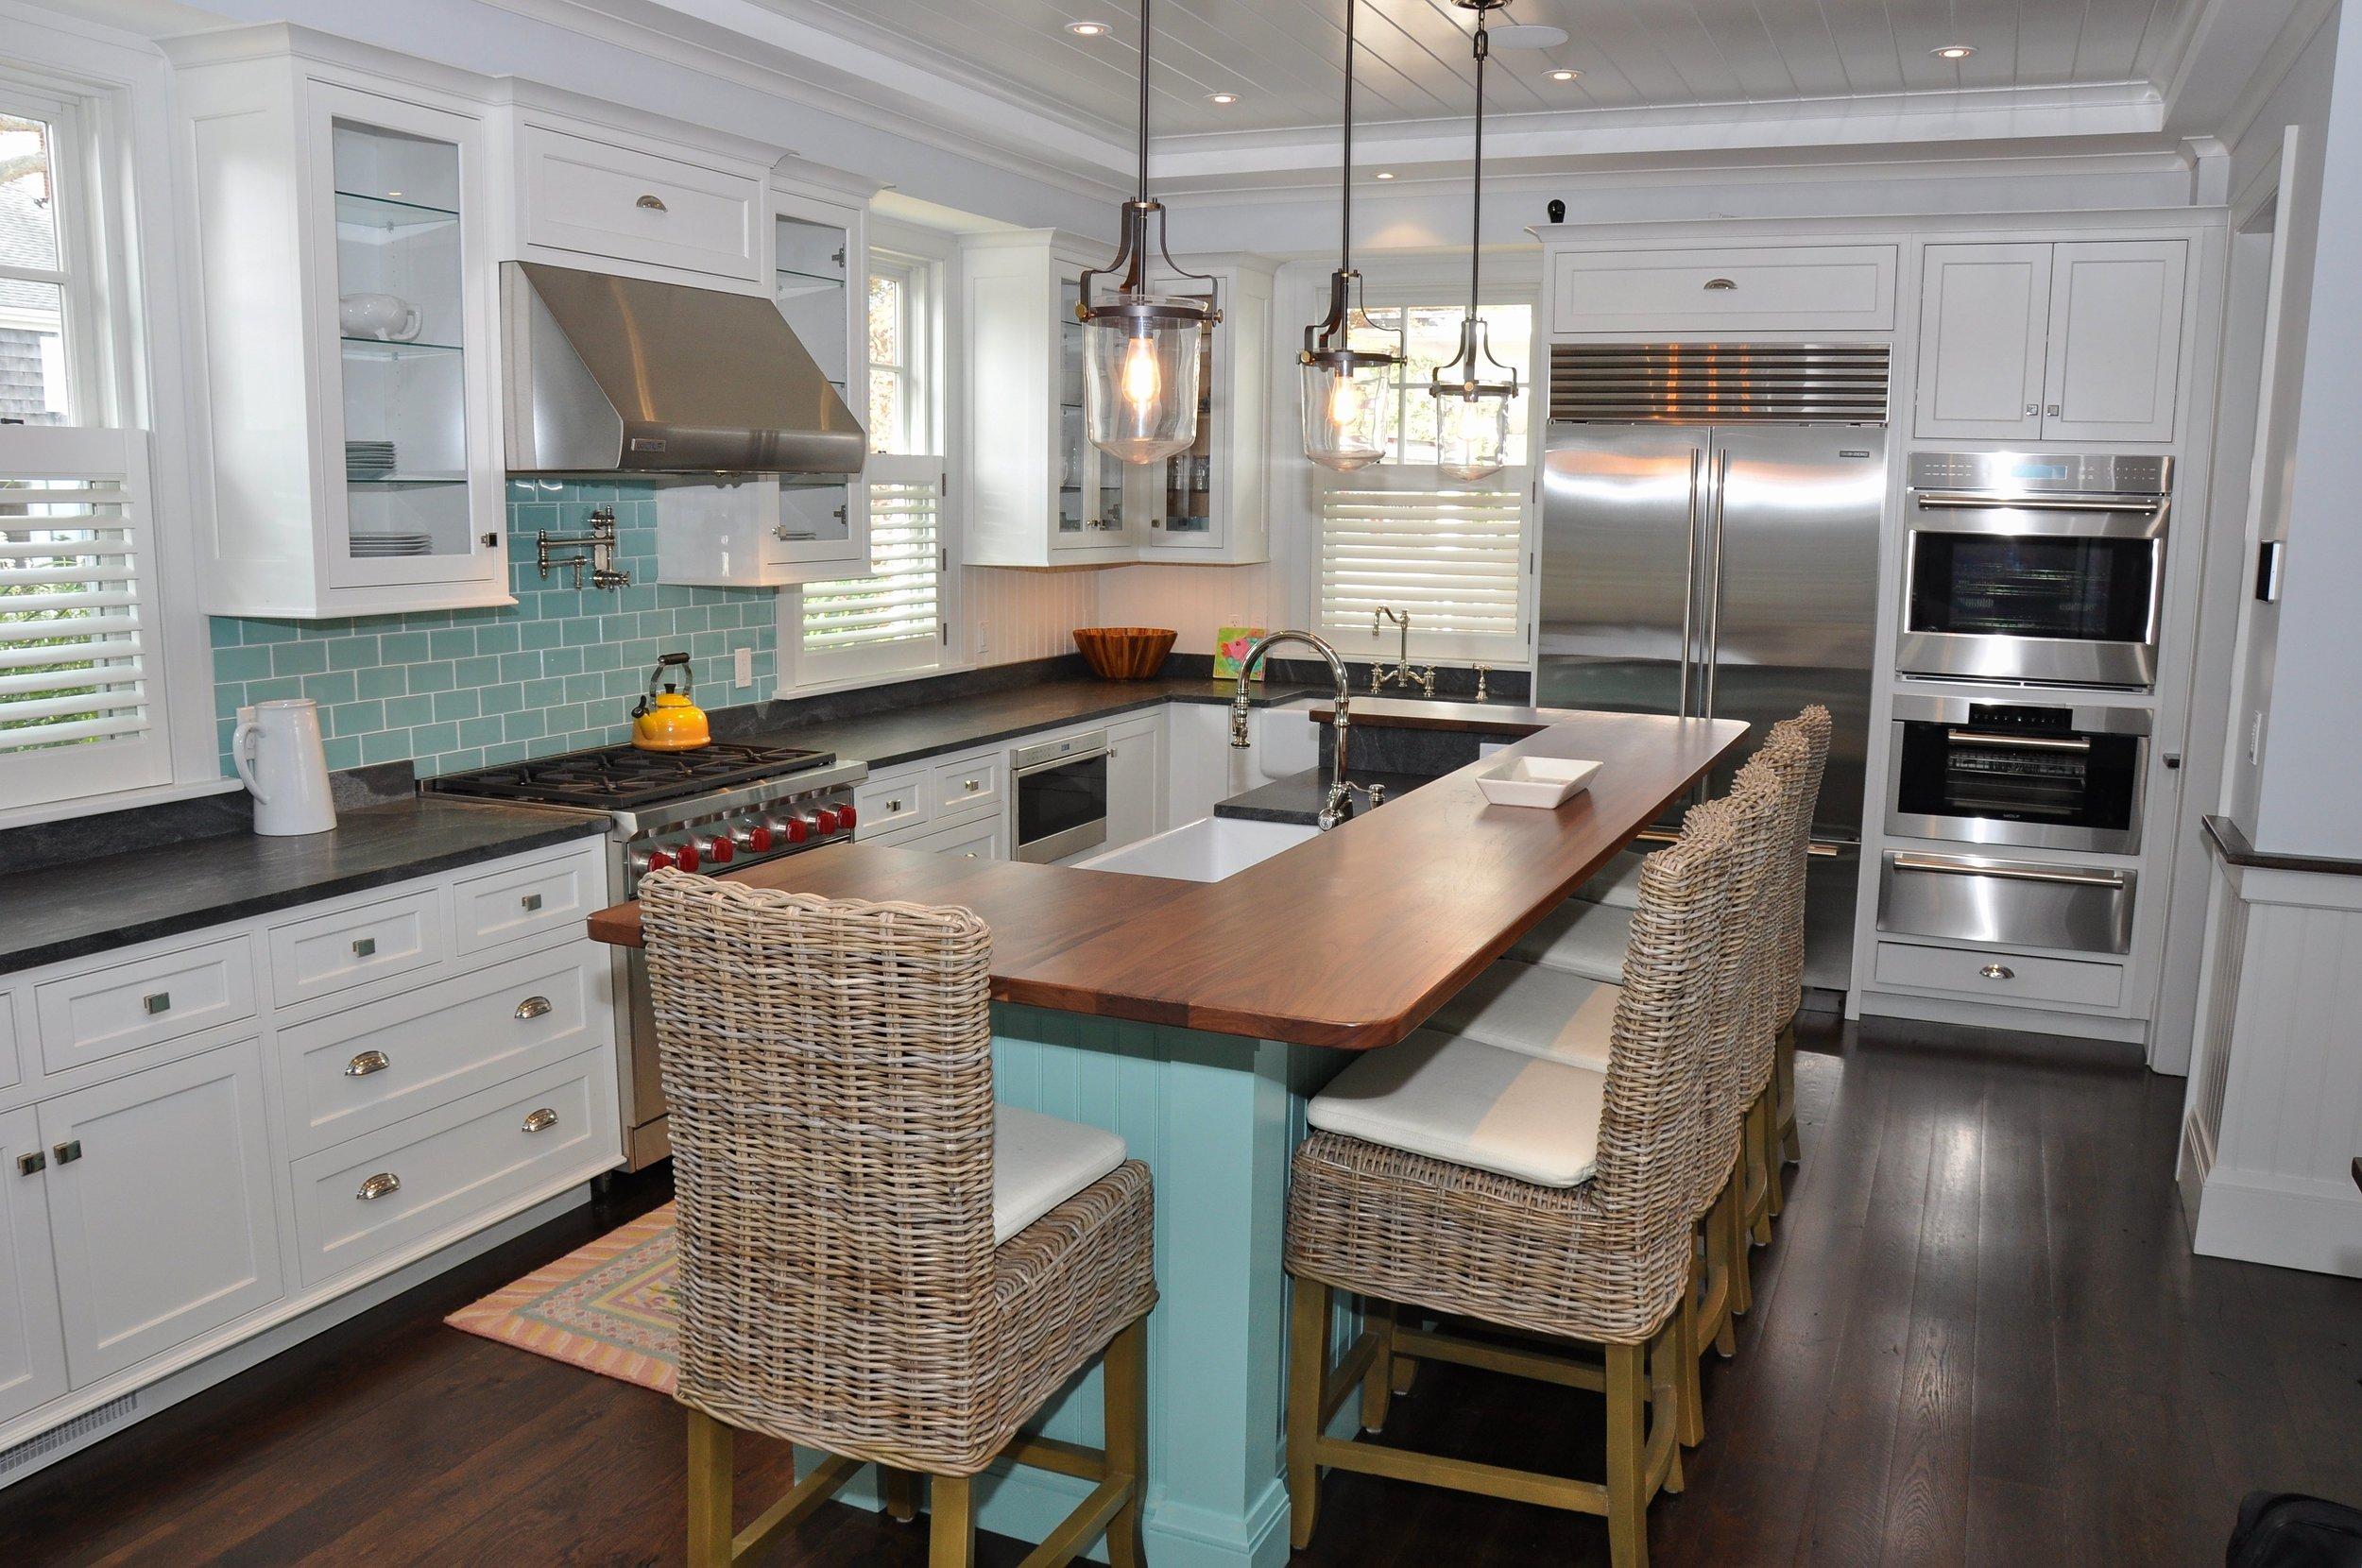 Modern_Turquoise_Teal_Kitchen_Island.jpg